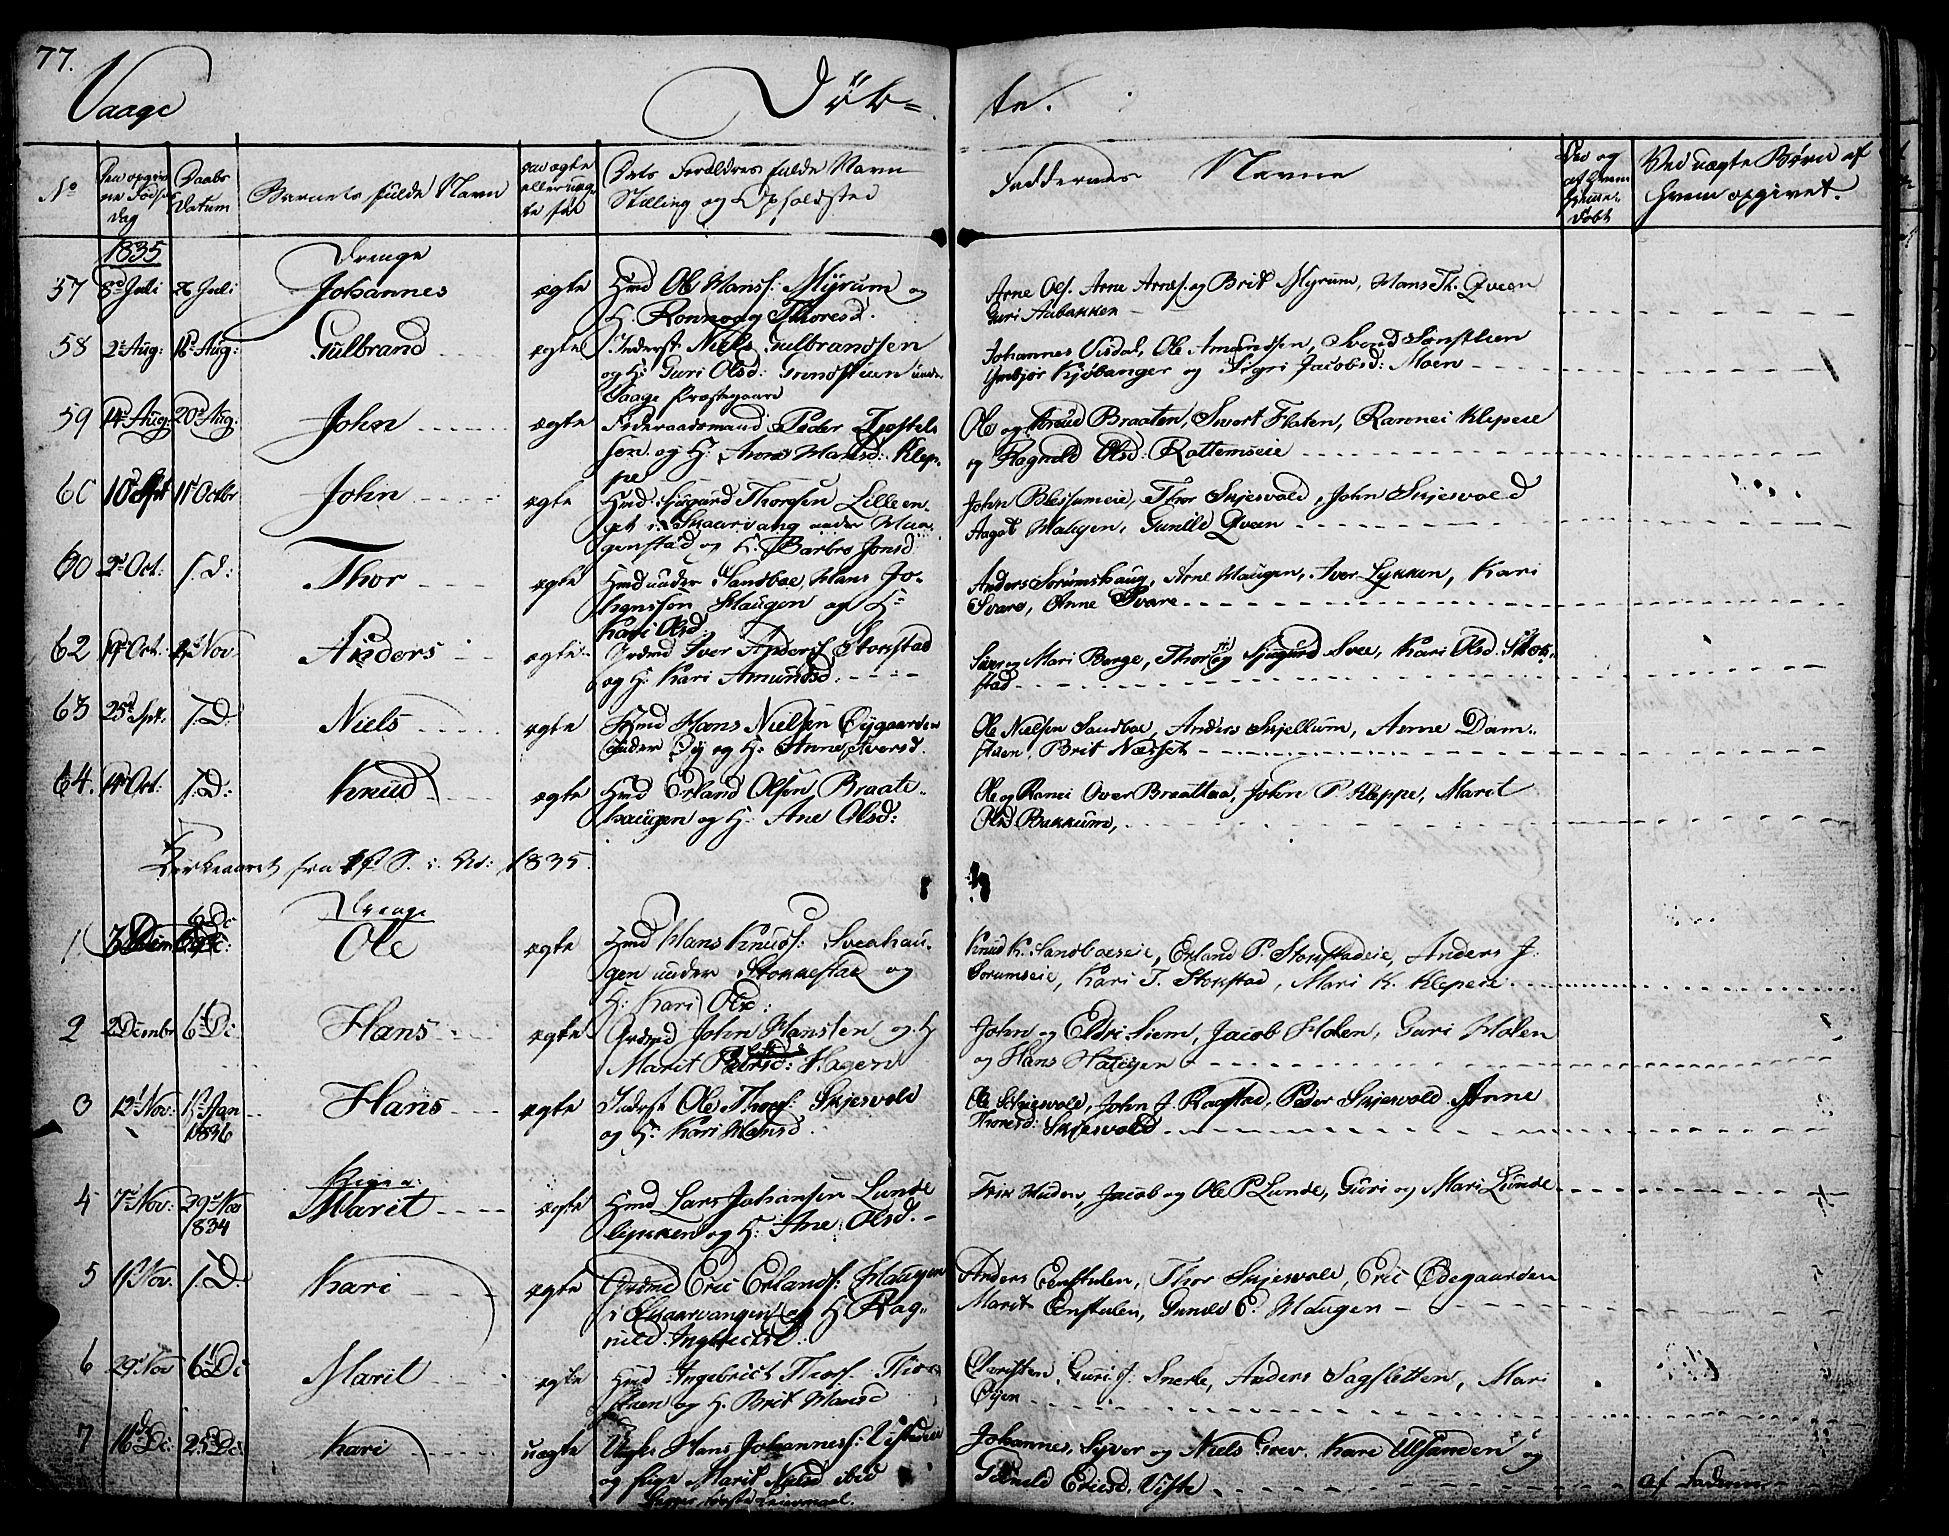 SAH, Vågå prestekontor, Ministerialbok nr. 4 /1, 1827-1842, s. 77